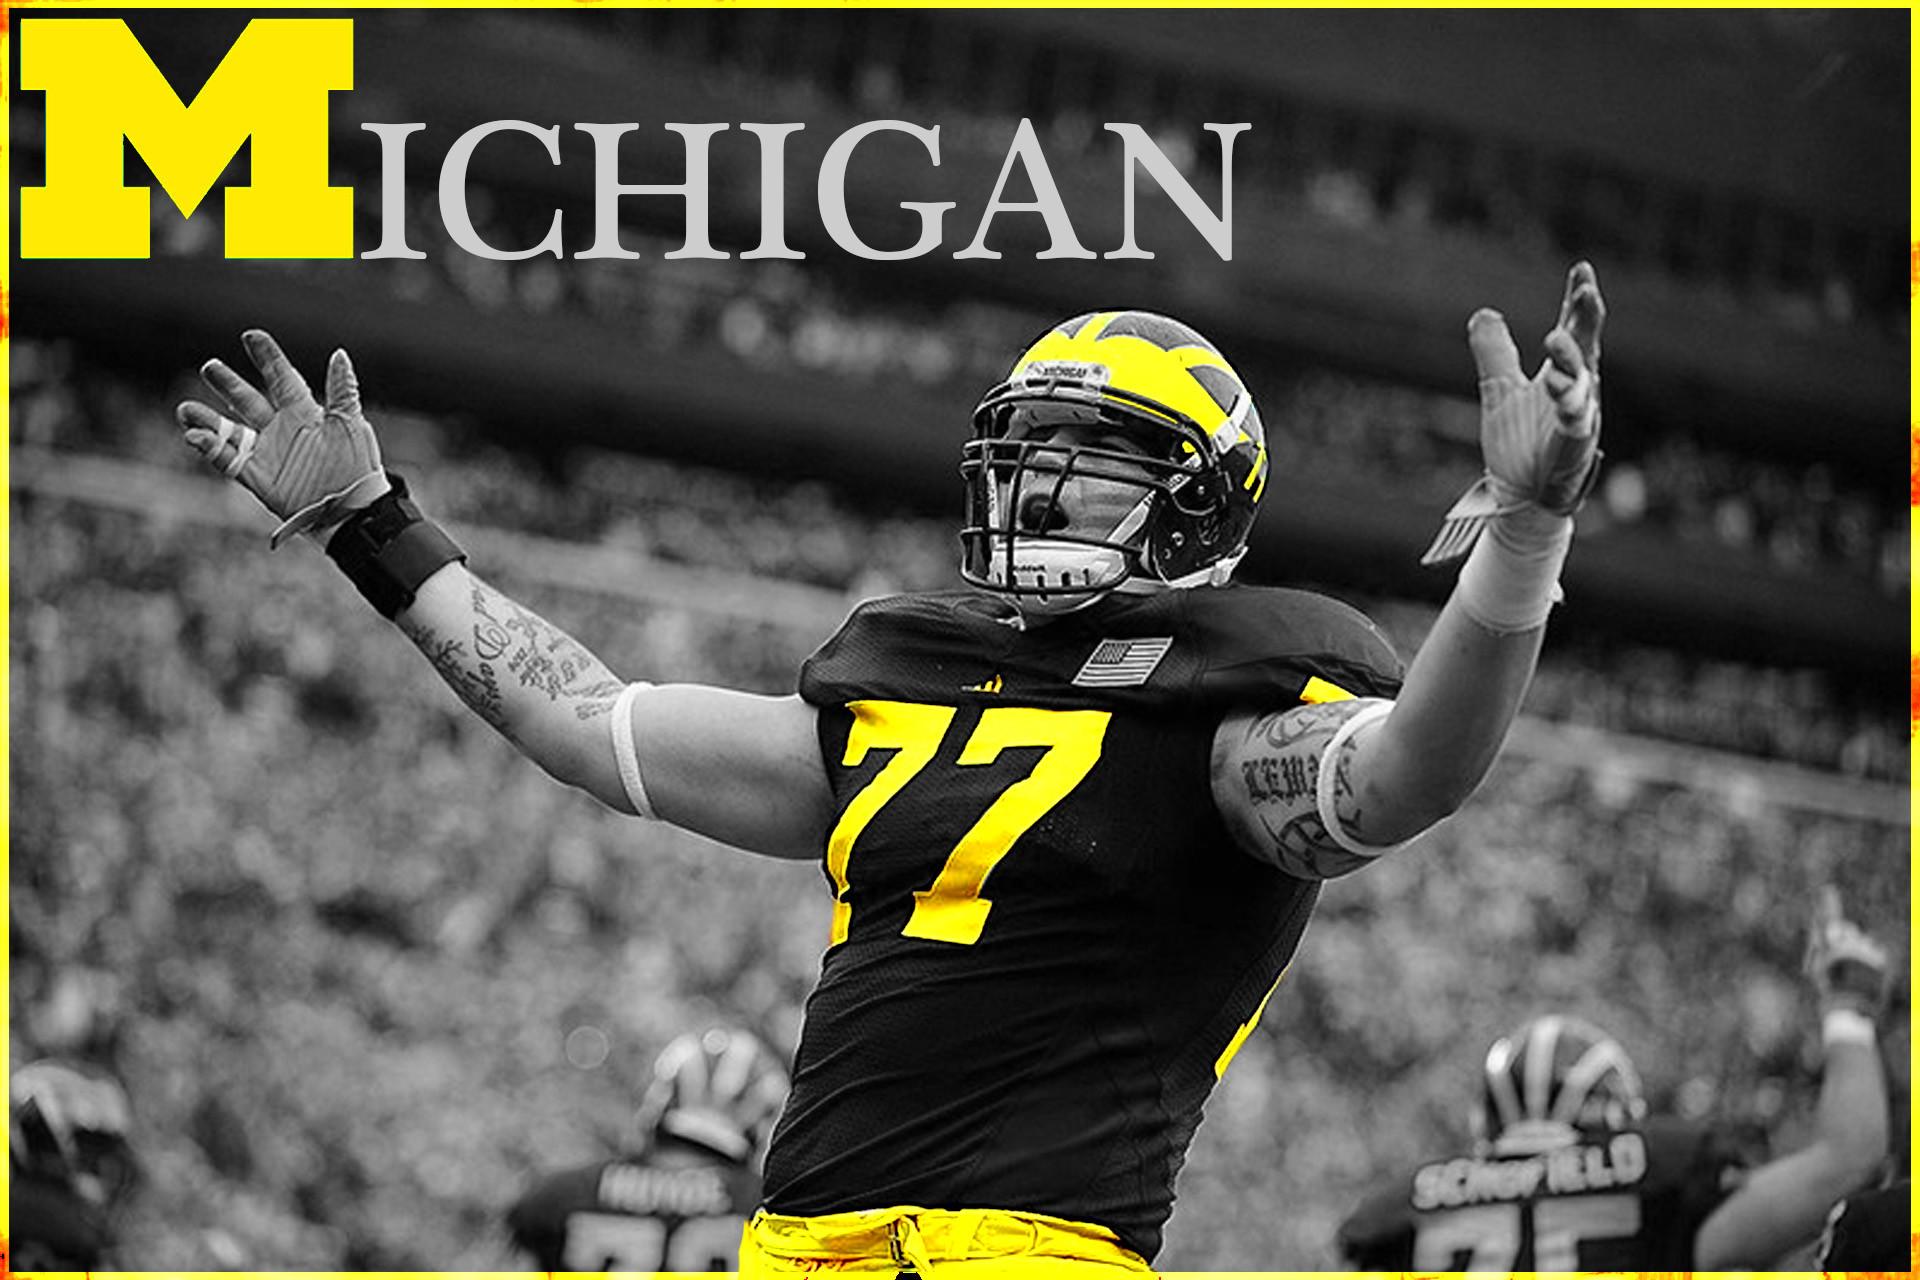 Michigan Football (id: 23189) | Buzzerg.com